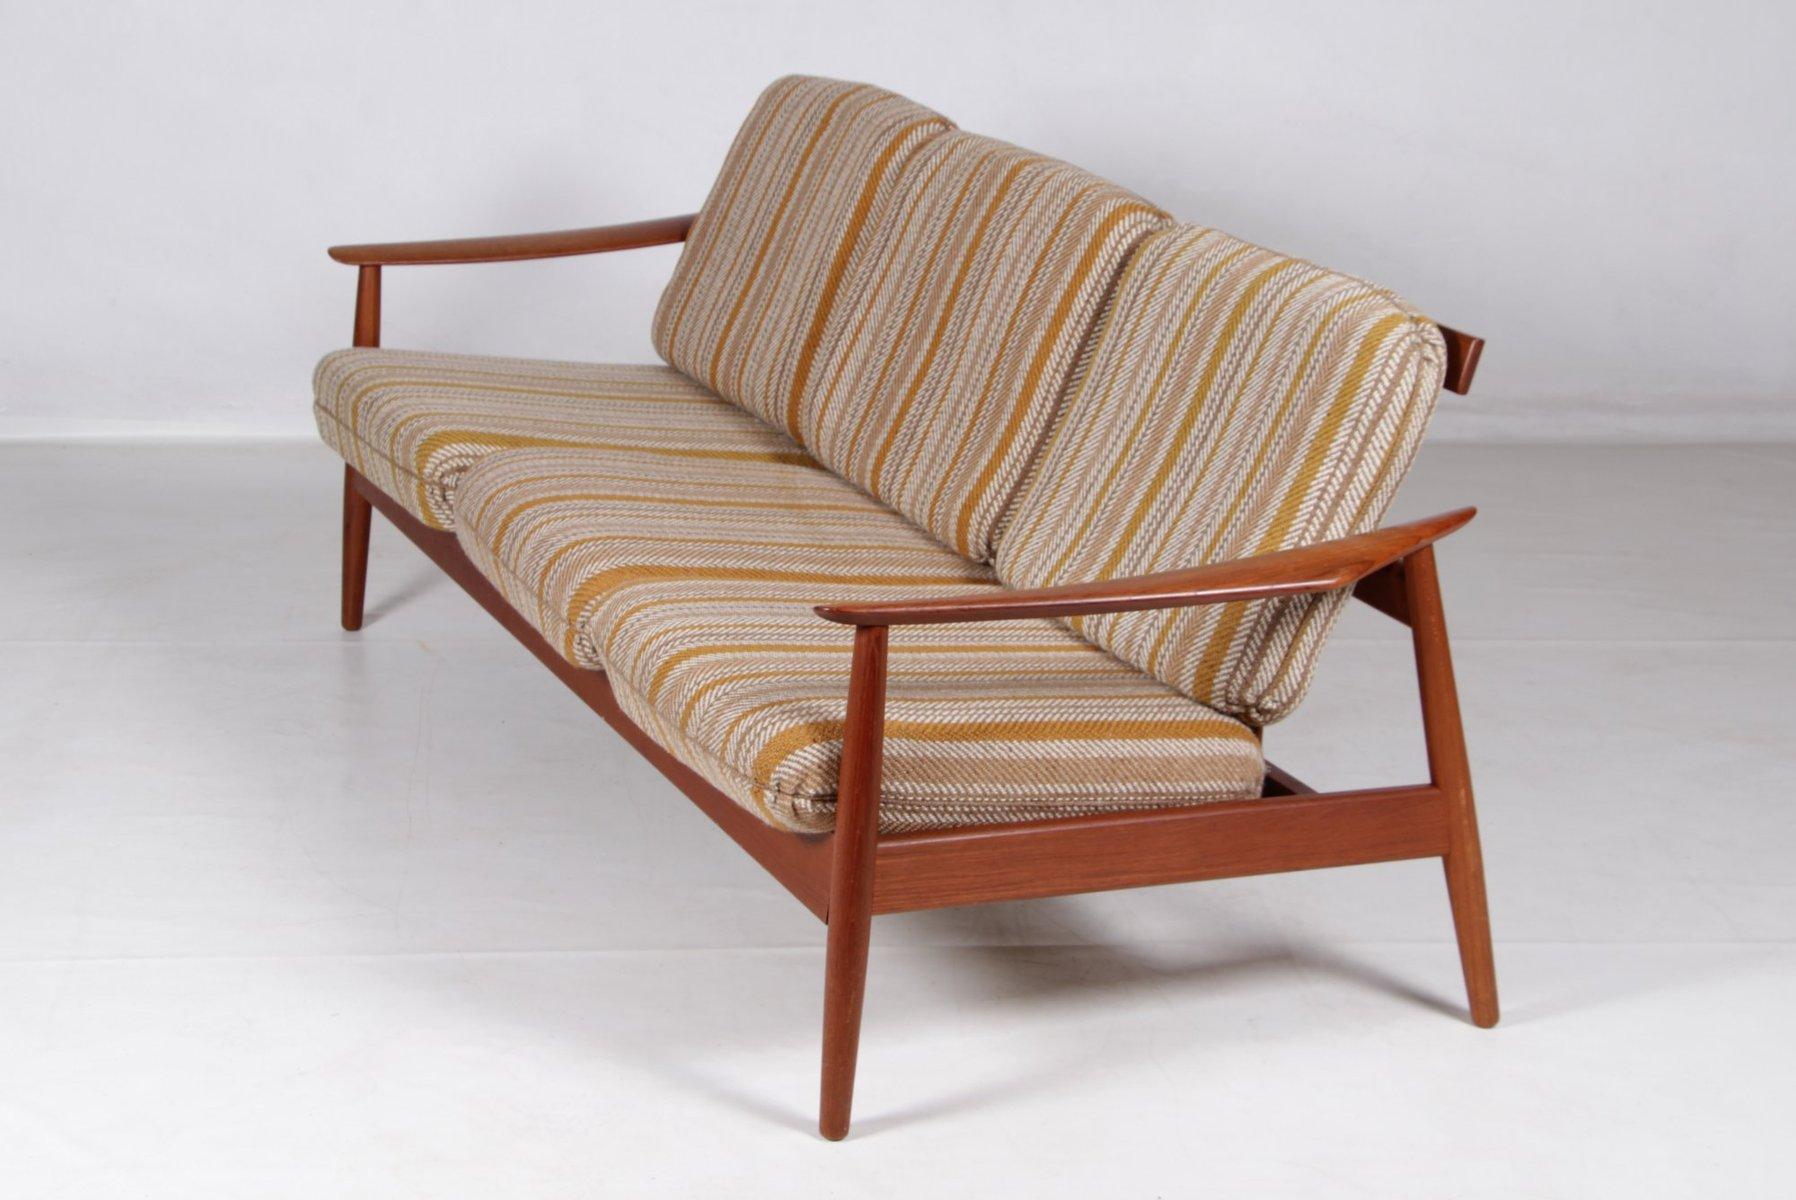 Teak Sofa By Arne Vodder For France Son 1960s For Sale At Pamono